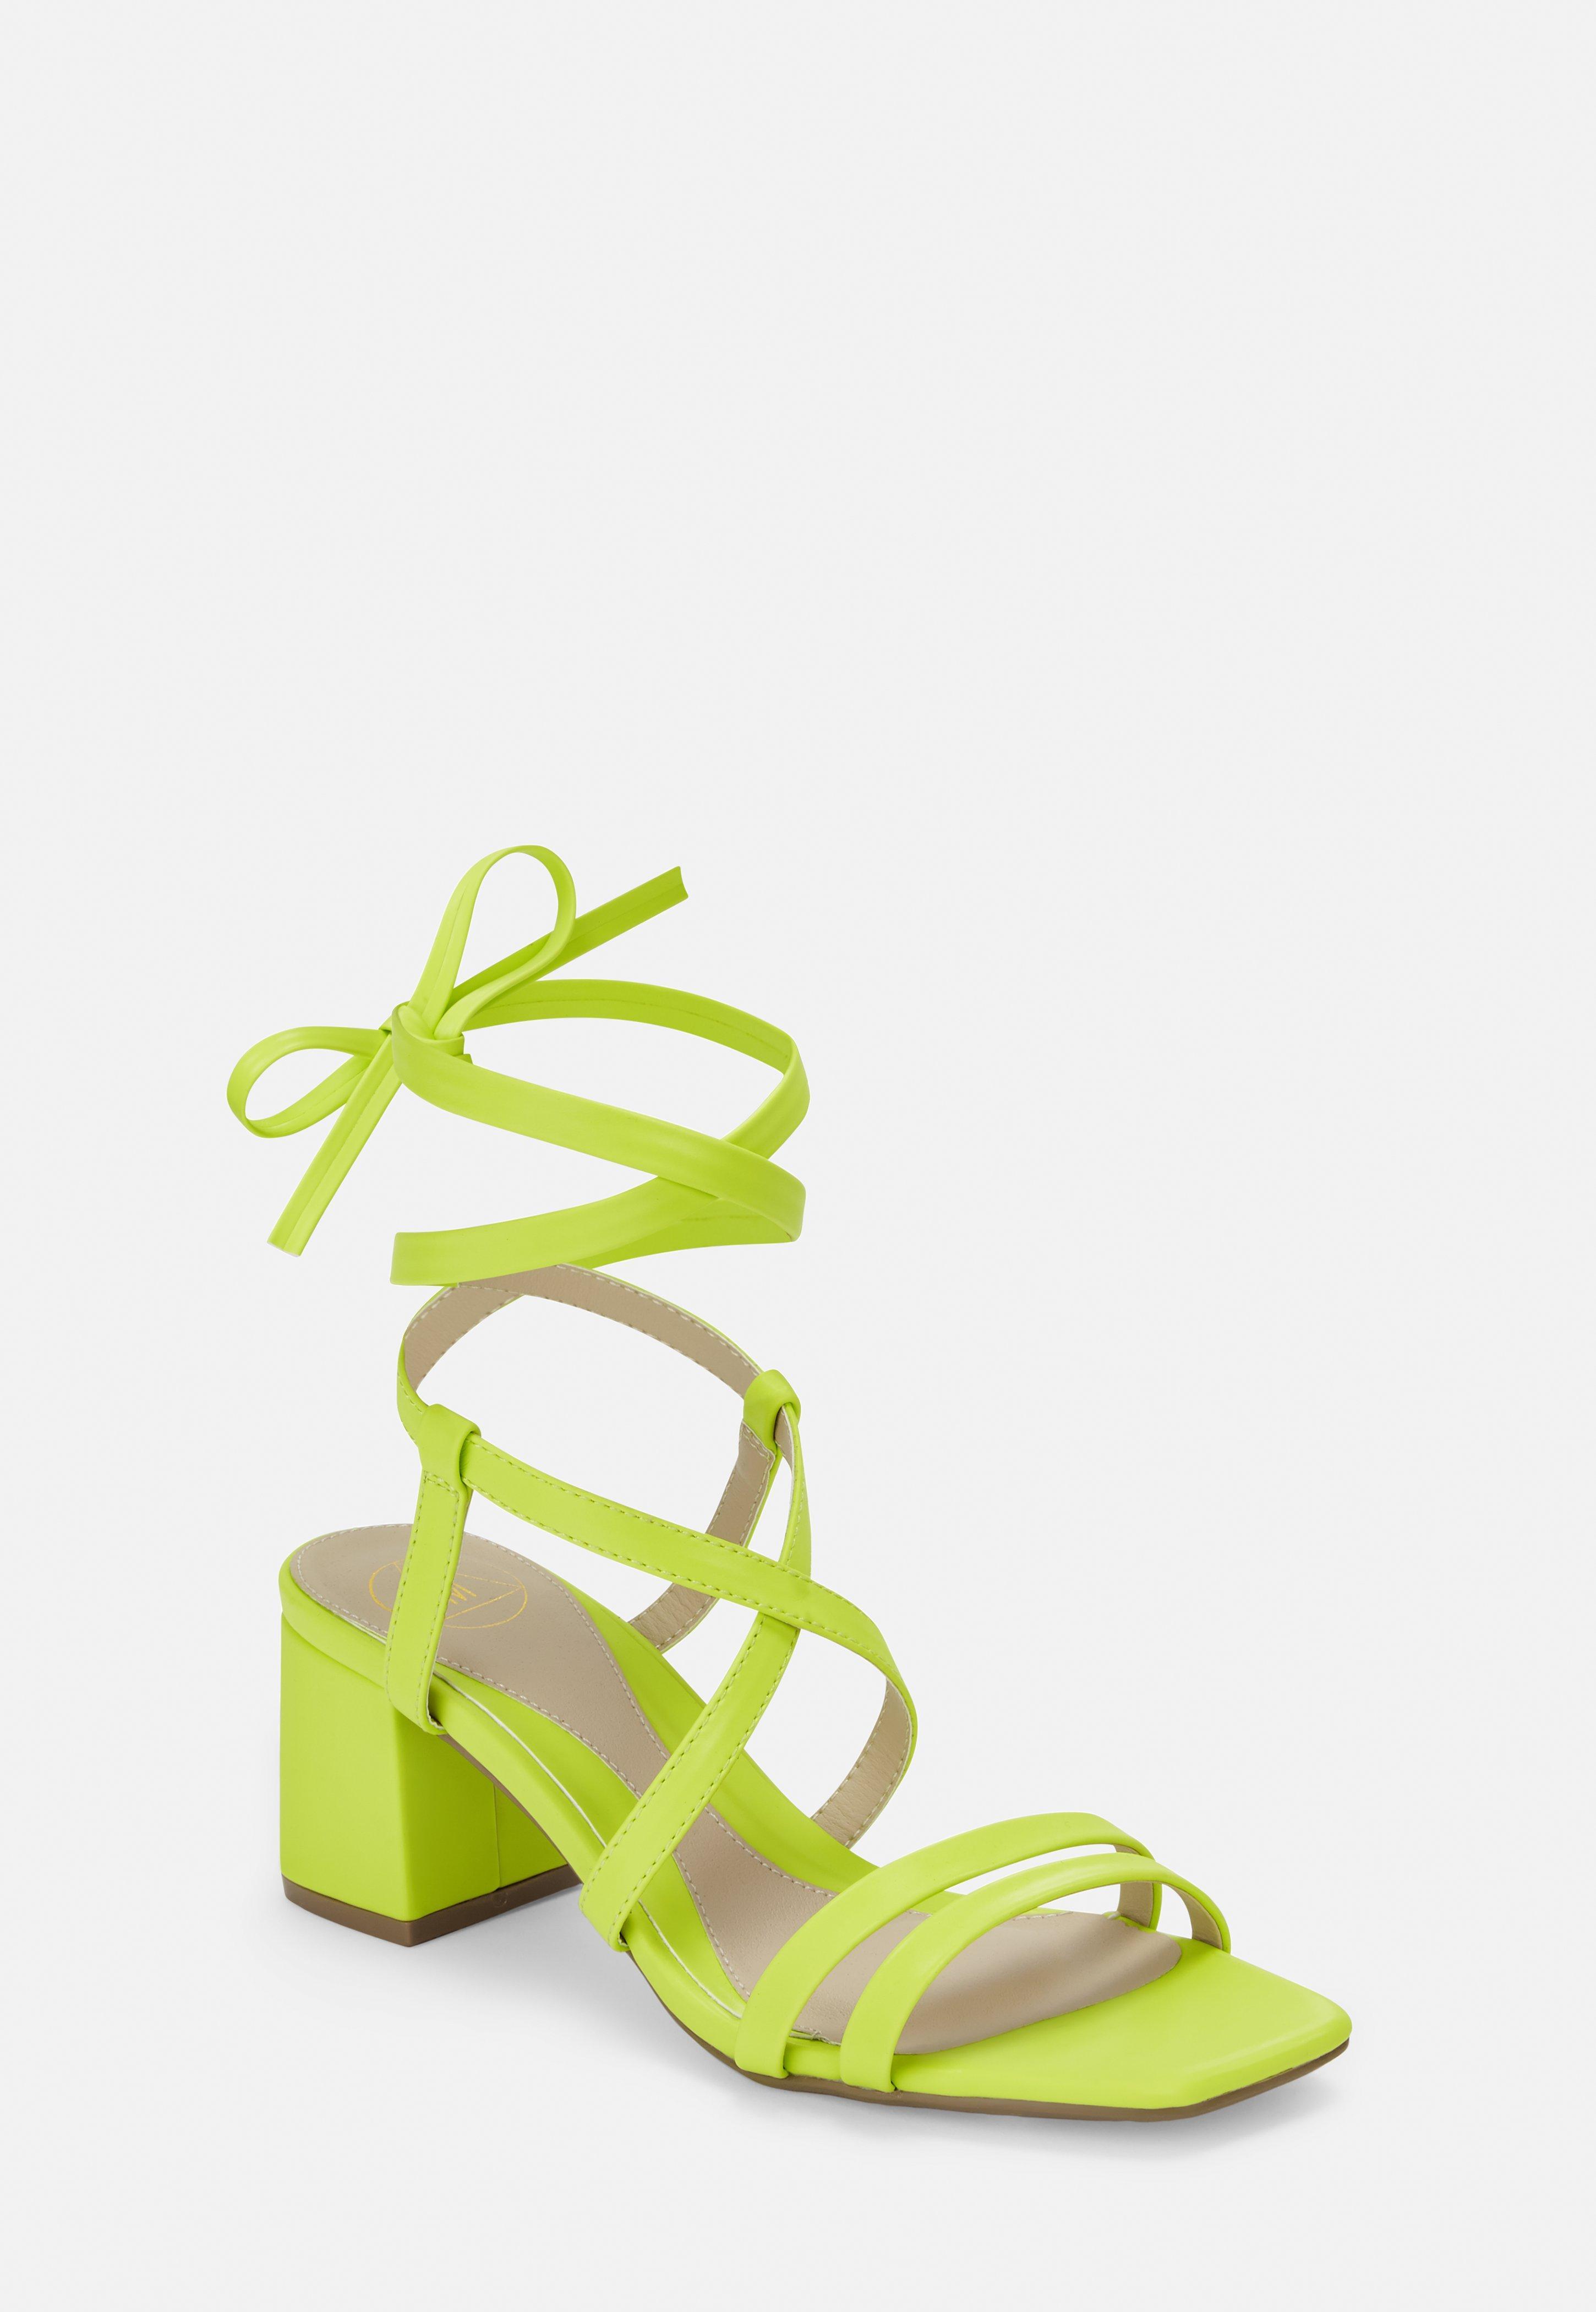 c2dcbf4bd749 High Heels - Shop Women's Stilettos Online | Missguided